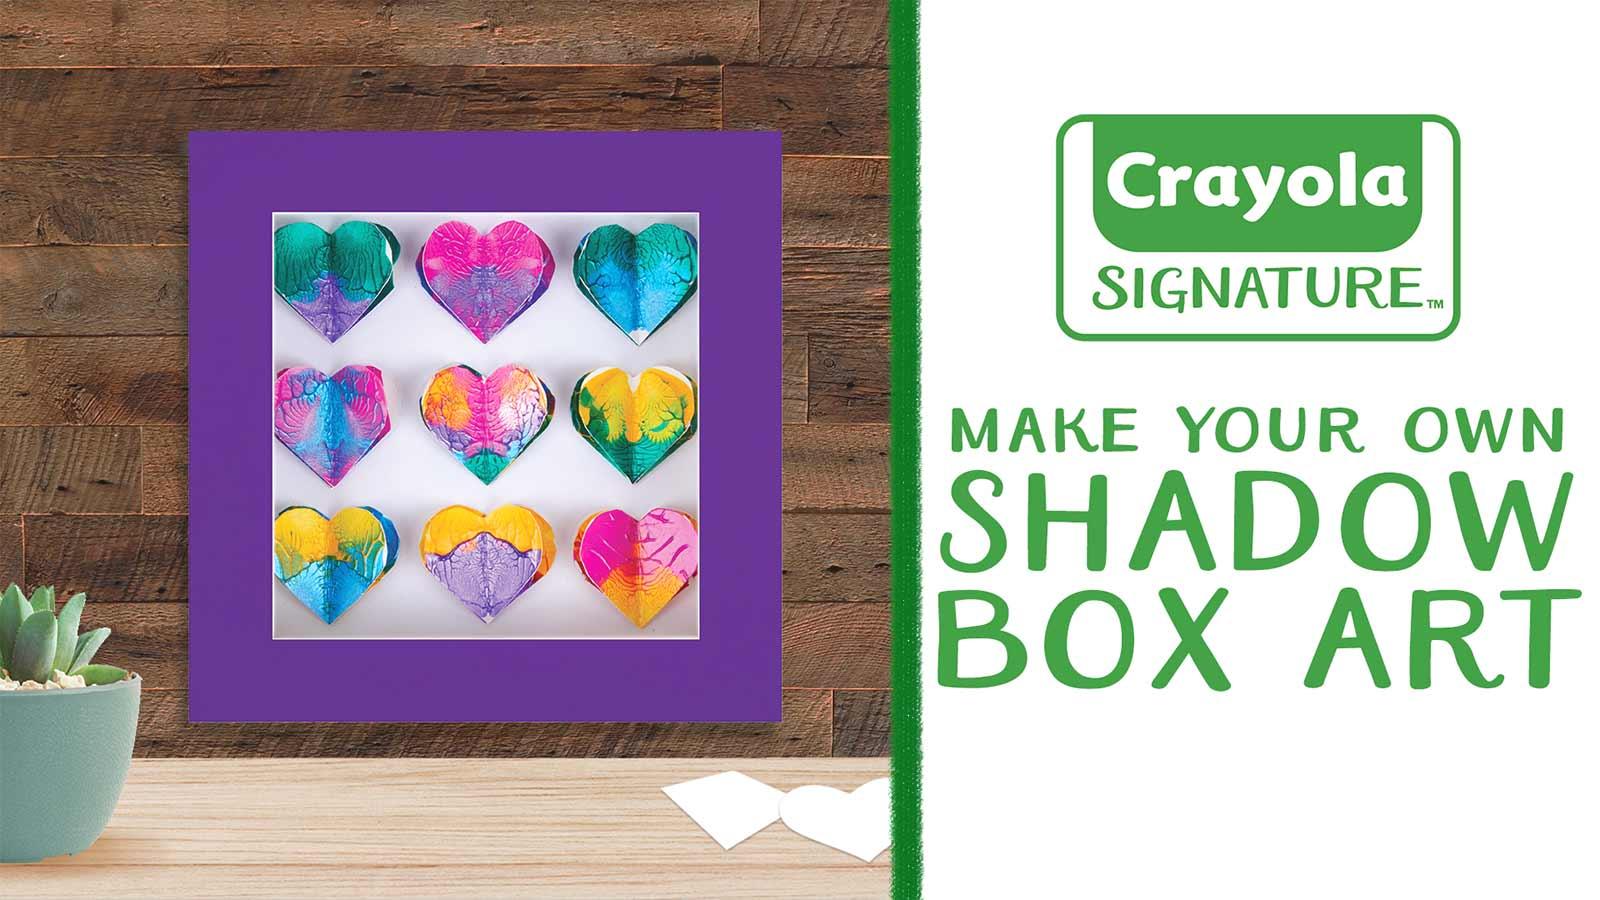 Signature Diy Shadow Box Frame Crafts Crayola Com Crayola